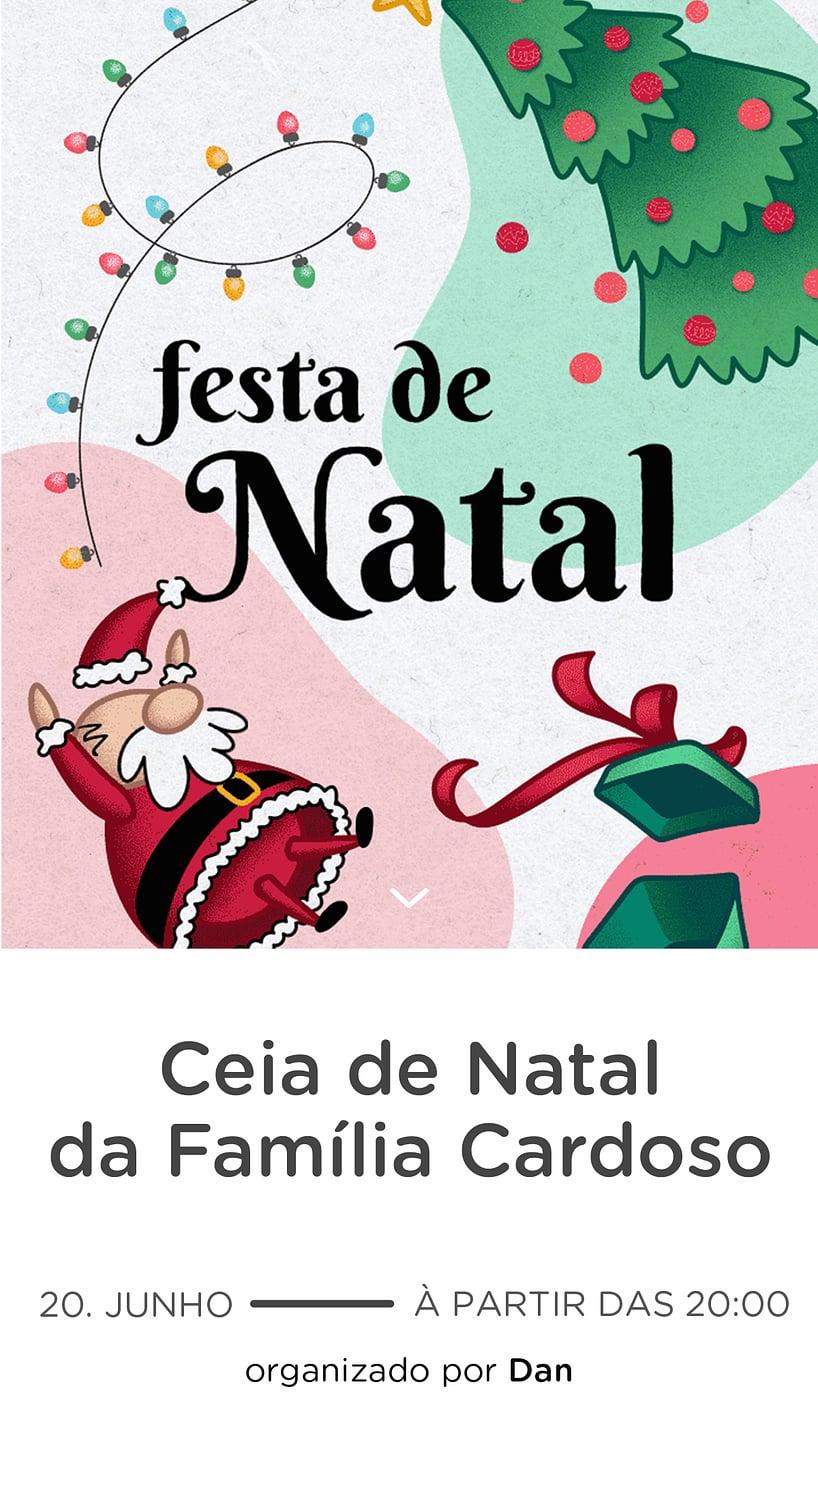 Convite Natal Gratis para Editar